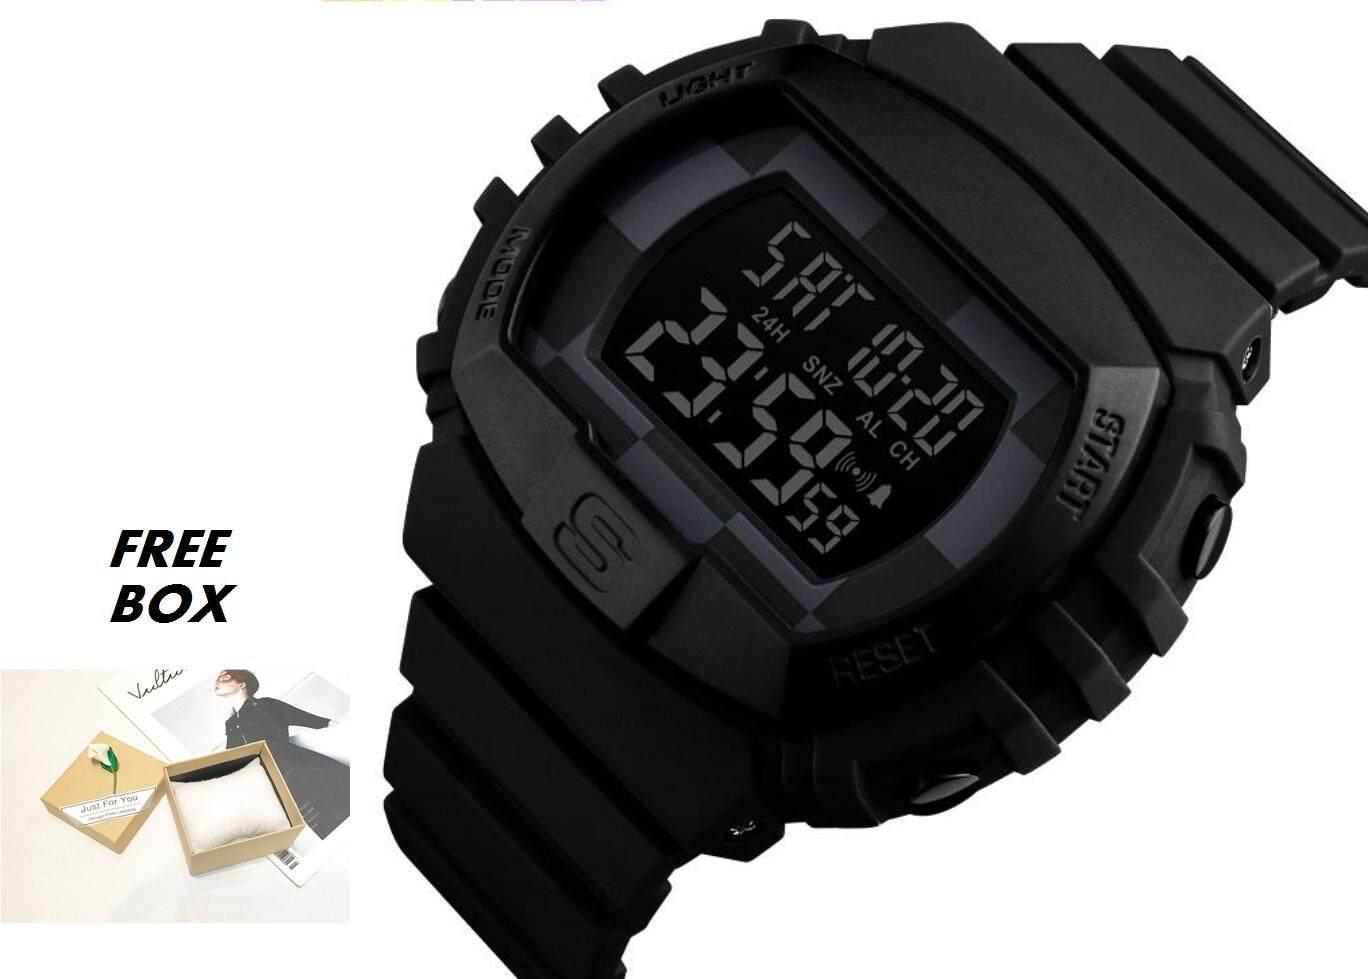 [BDAY SALE] 100% Brand New Mens Sports Watches Military Fashion Multifunction Chrono Waterproof Digital Wristwatches Jam Tangan Lelaki Malaysia